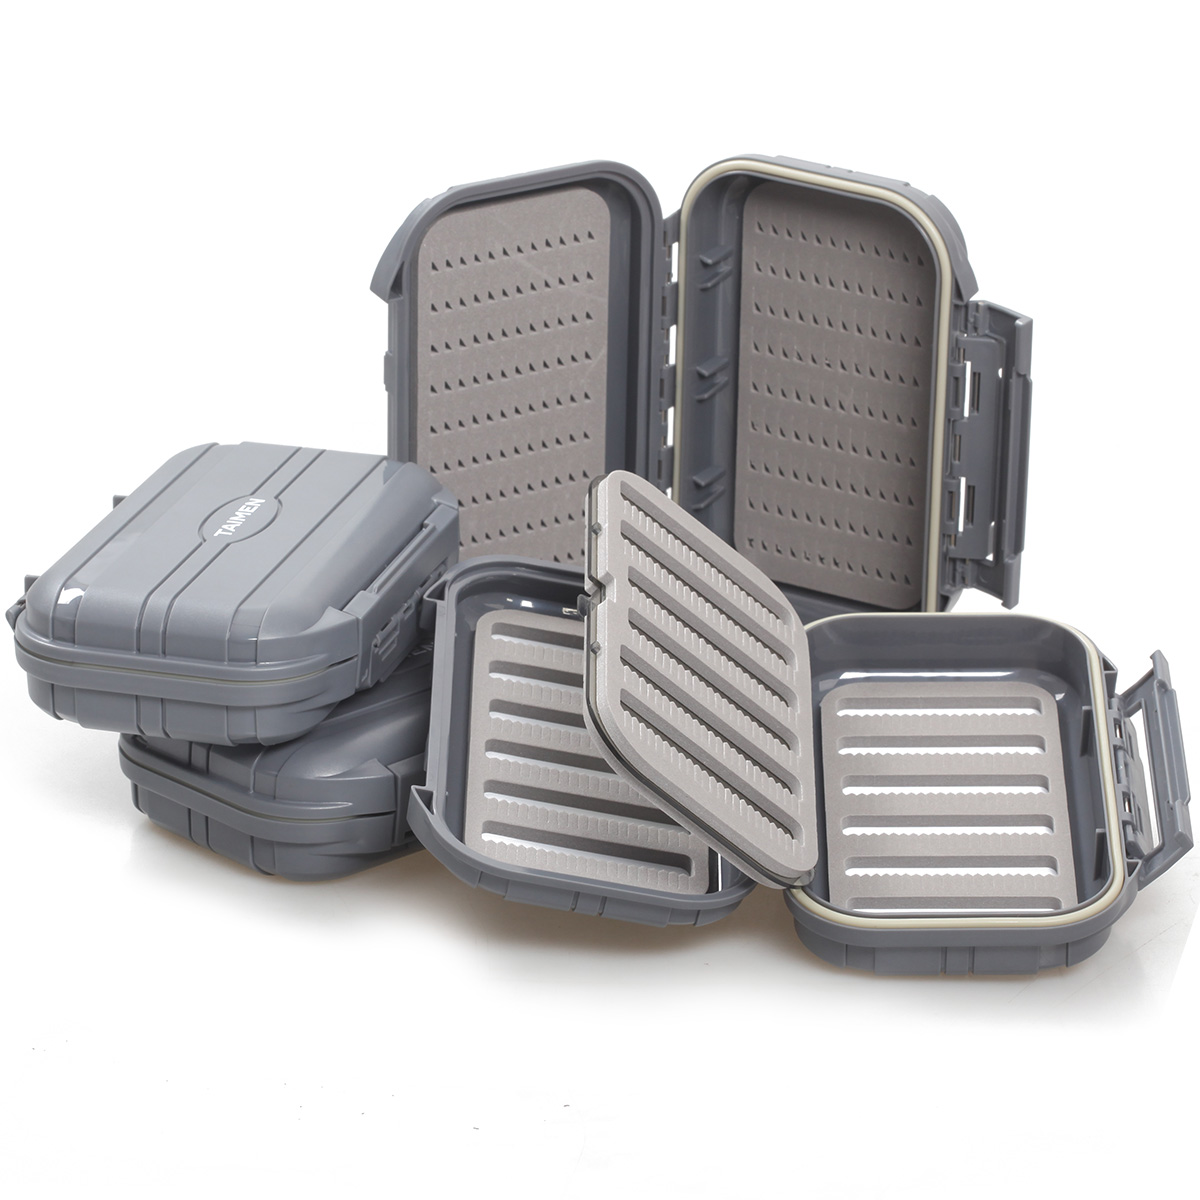 Taimen waterproof fly box 3000 fly fishing boxes ebay for Fly fishing box